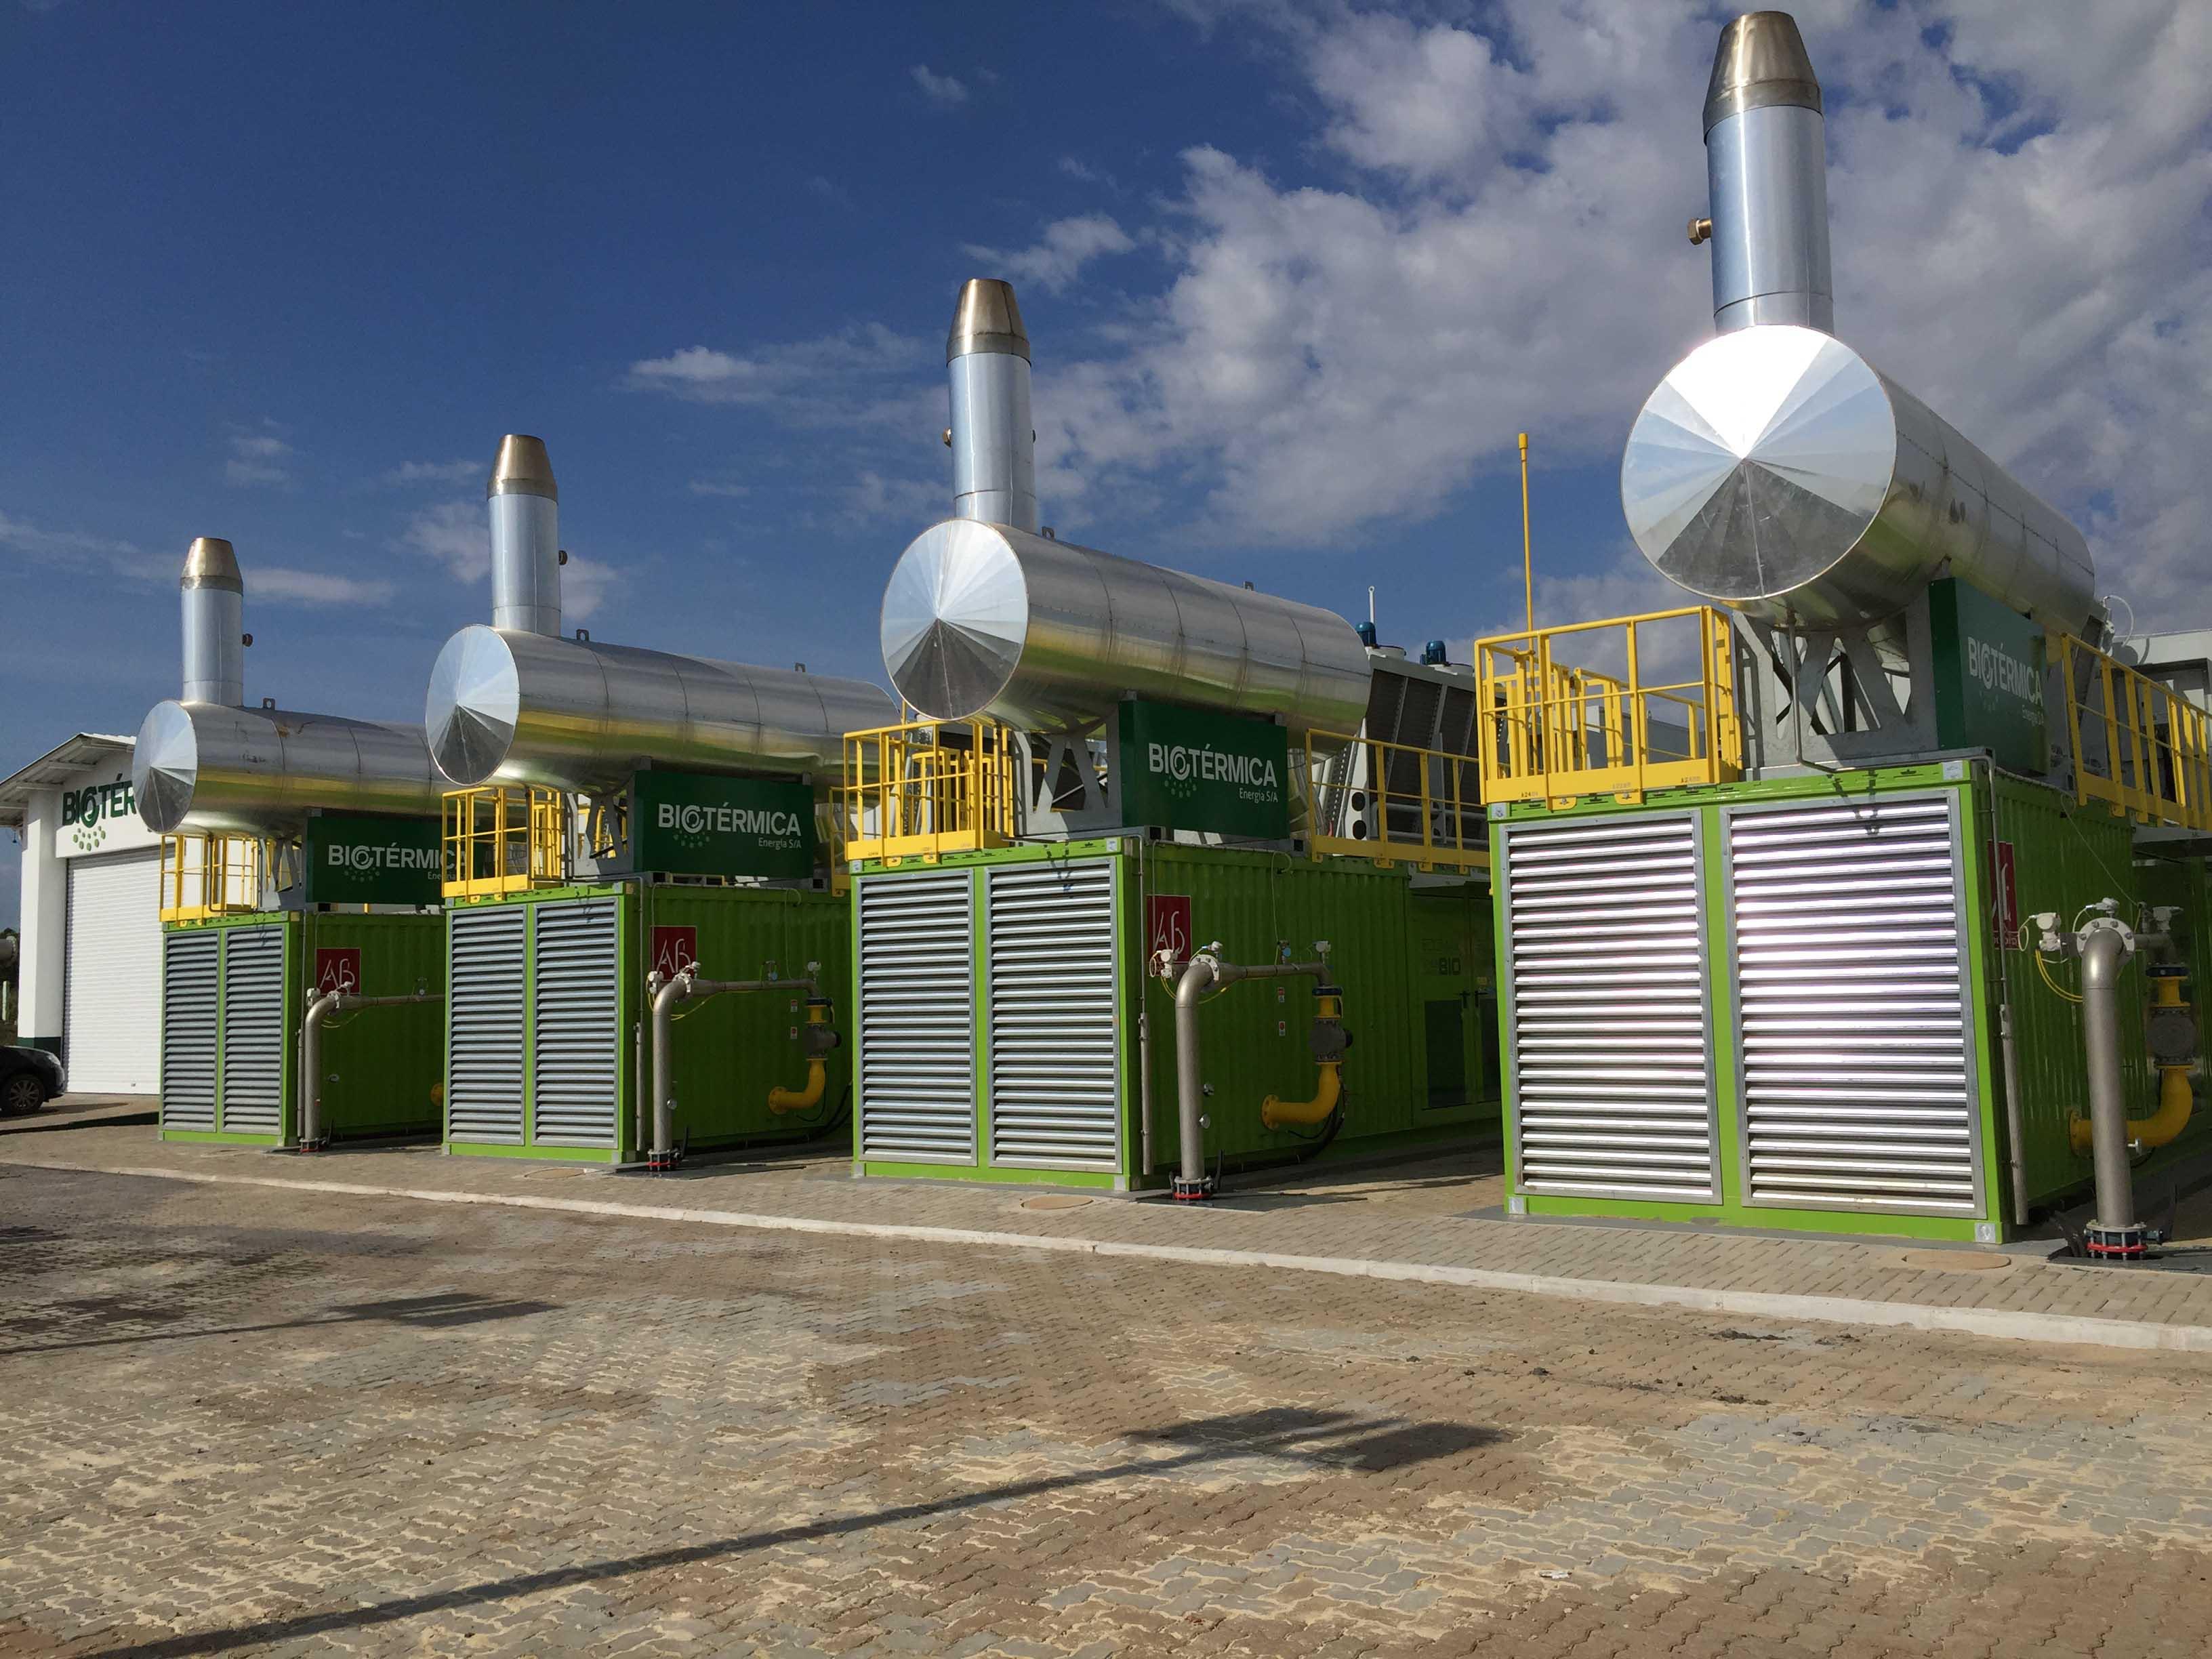 Geradores de energia elétrica a partir de biogás